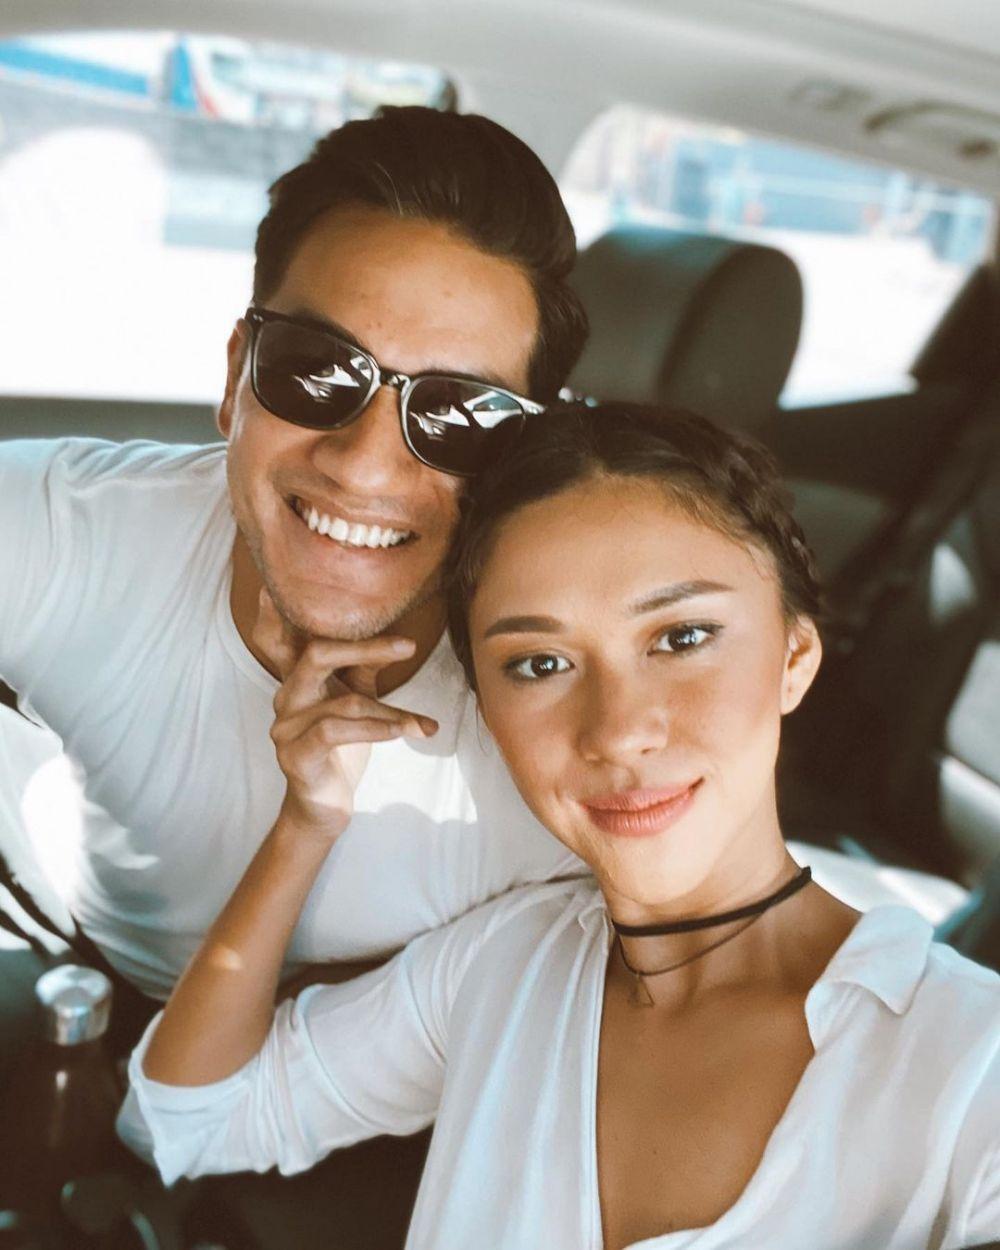 10 Adu Mesra Nana Mirdad vs Naysila Mirdad dengan Pasangan, Romantis!